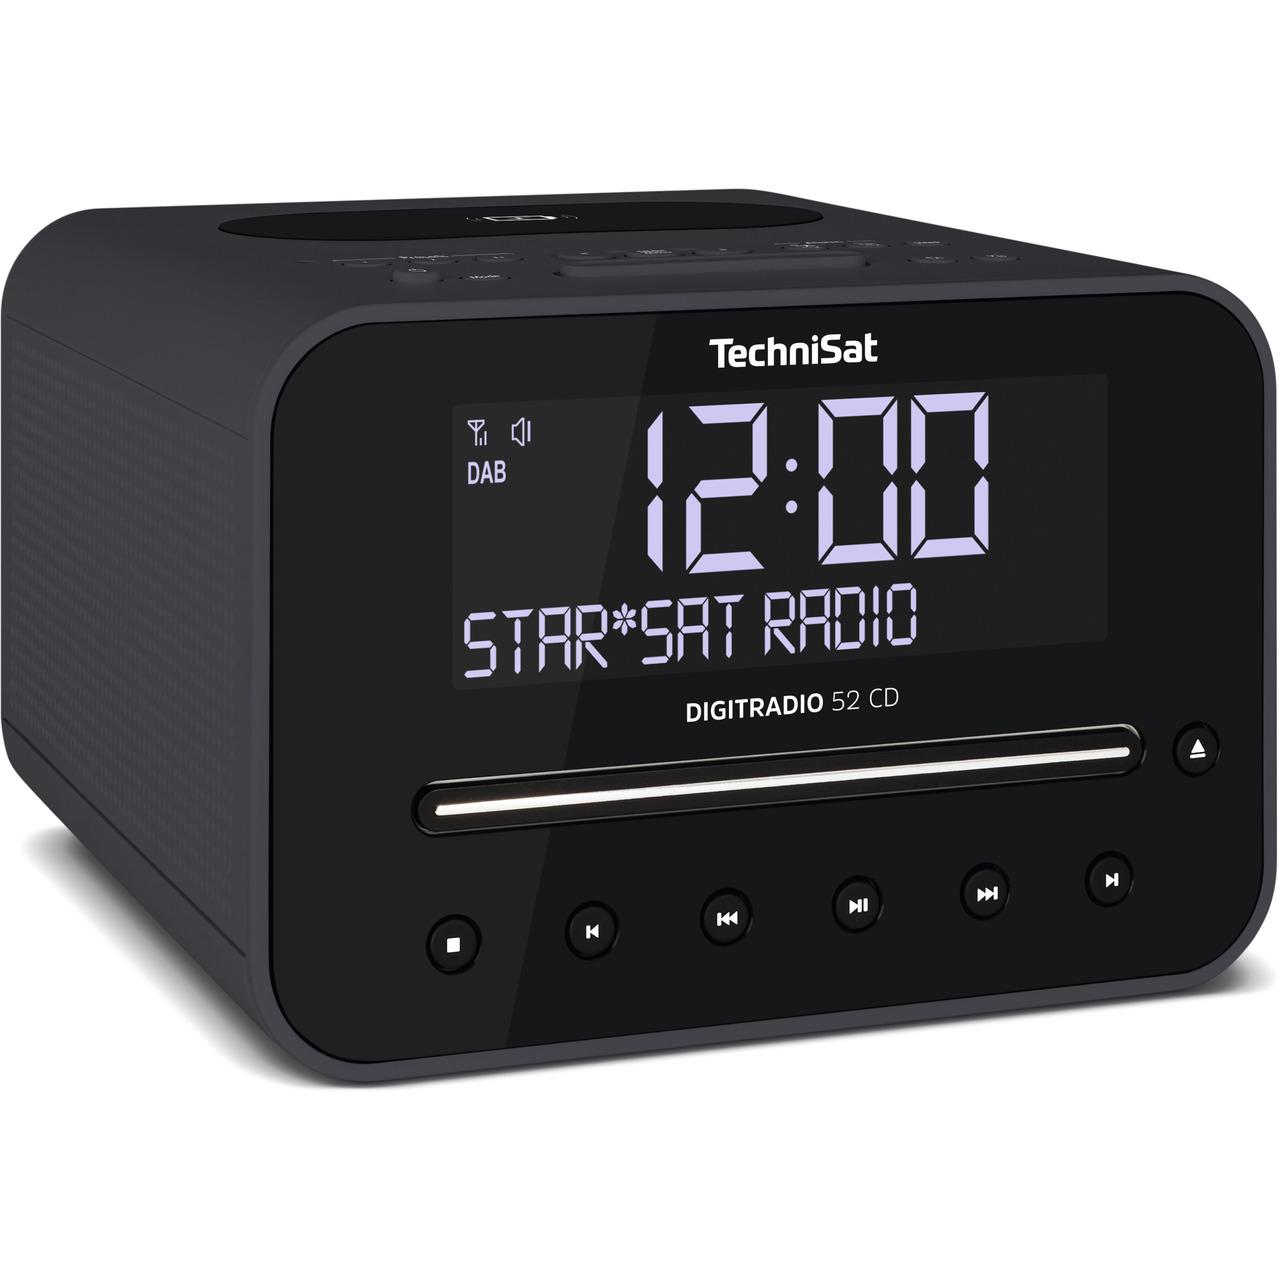 TechniSat DigitRadio 52 CD- mit DAB+-UKW-Empfang- CD-Player und Bluetooth-Funktion